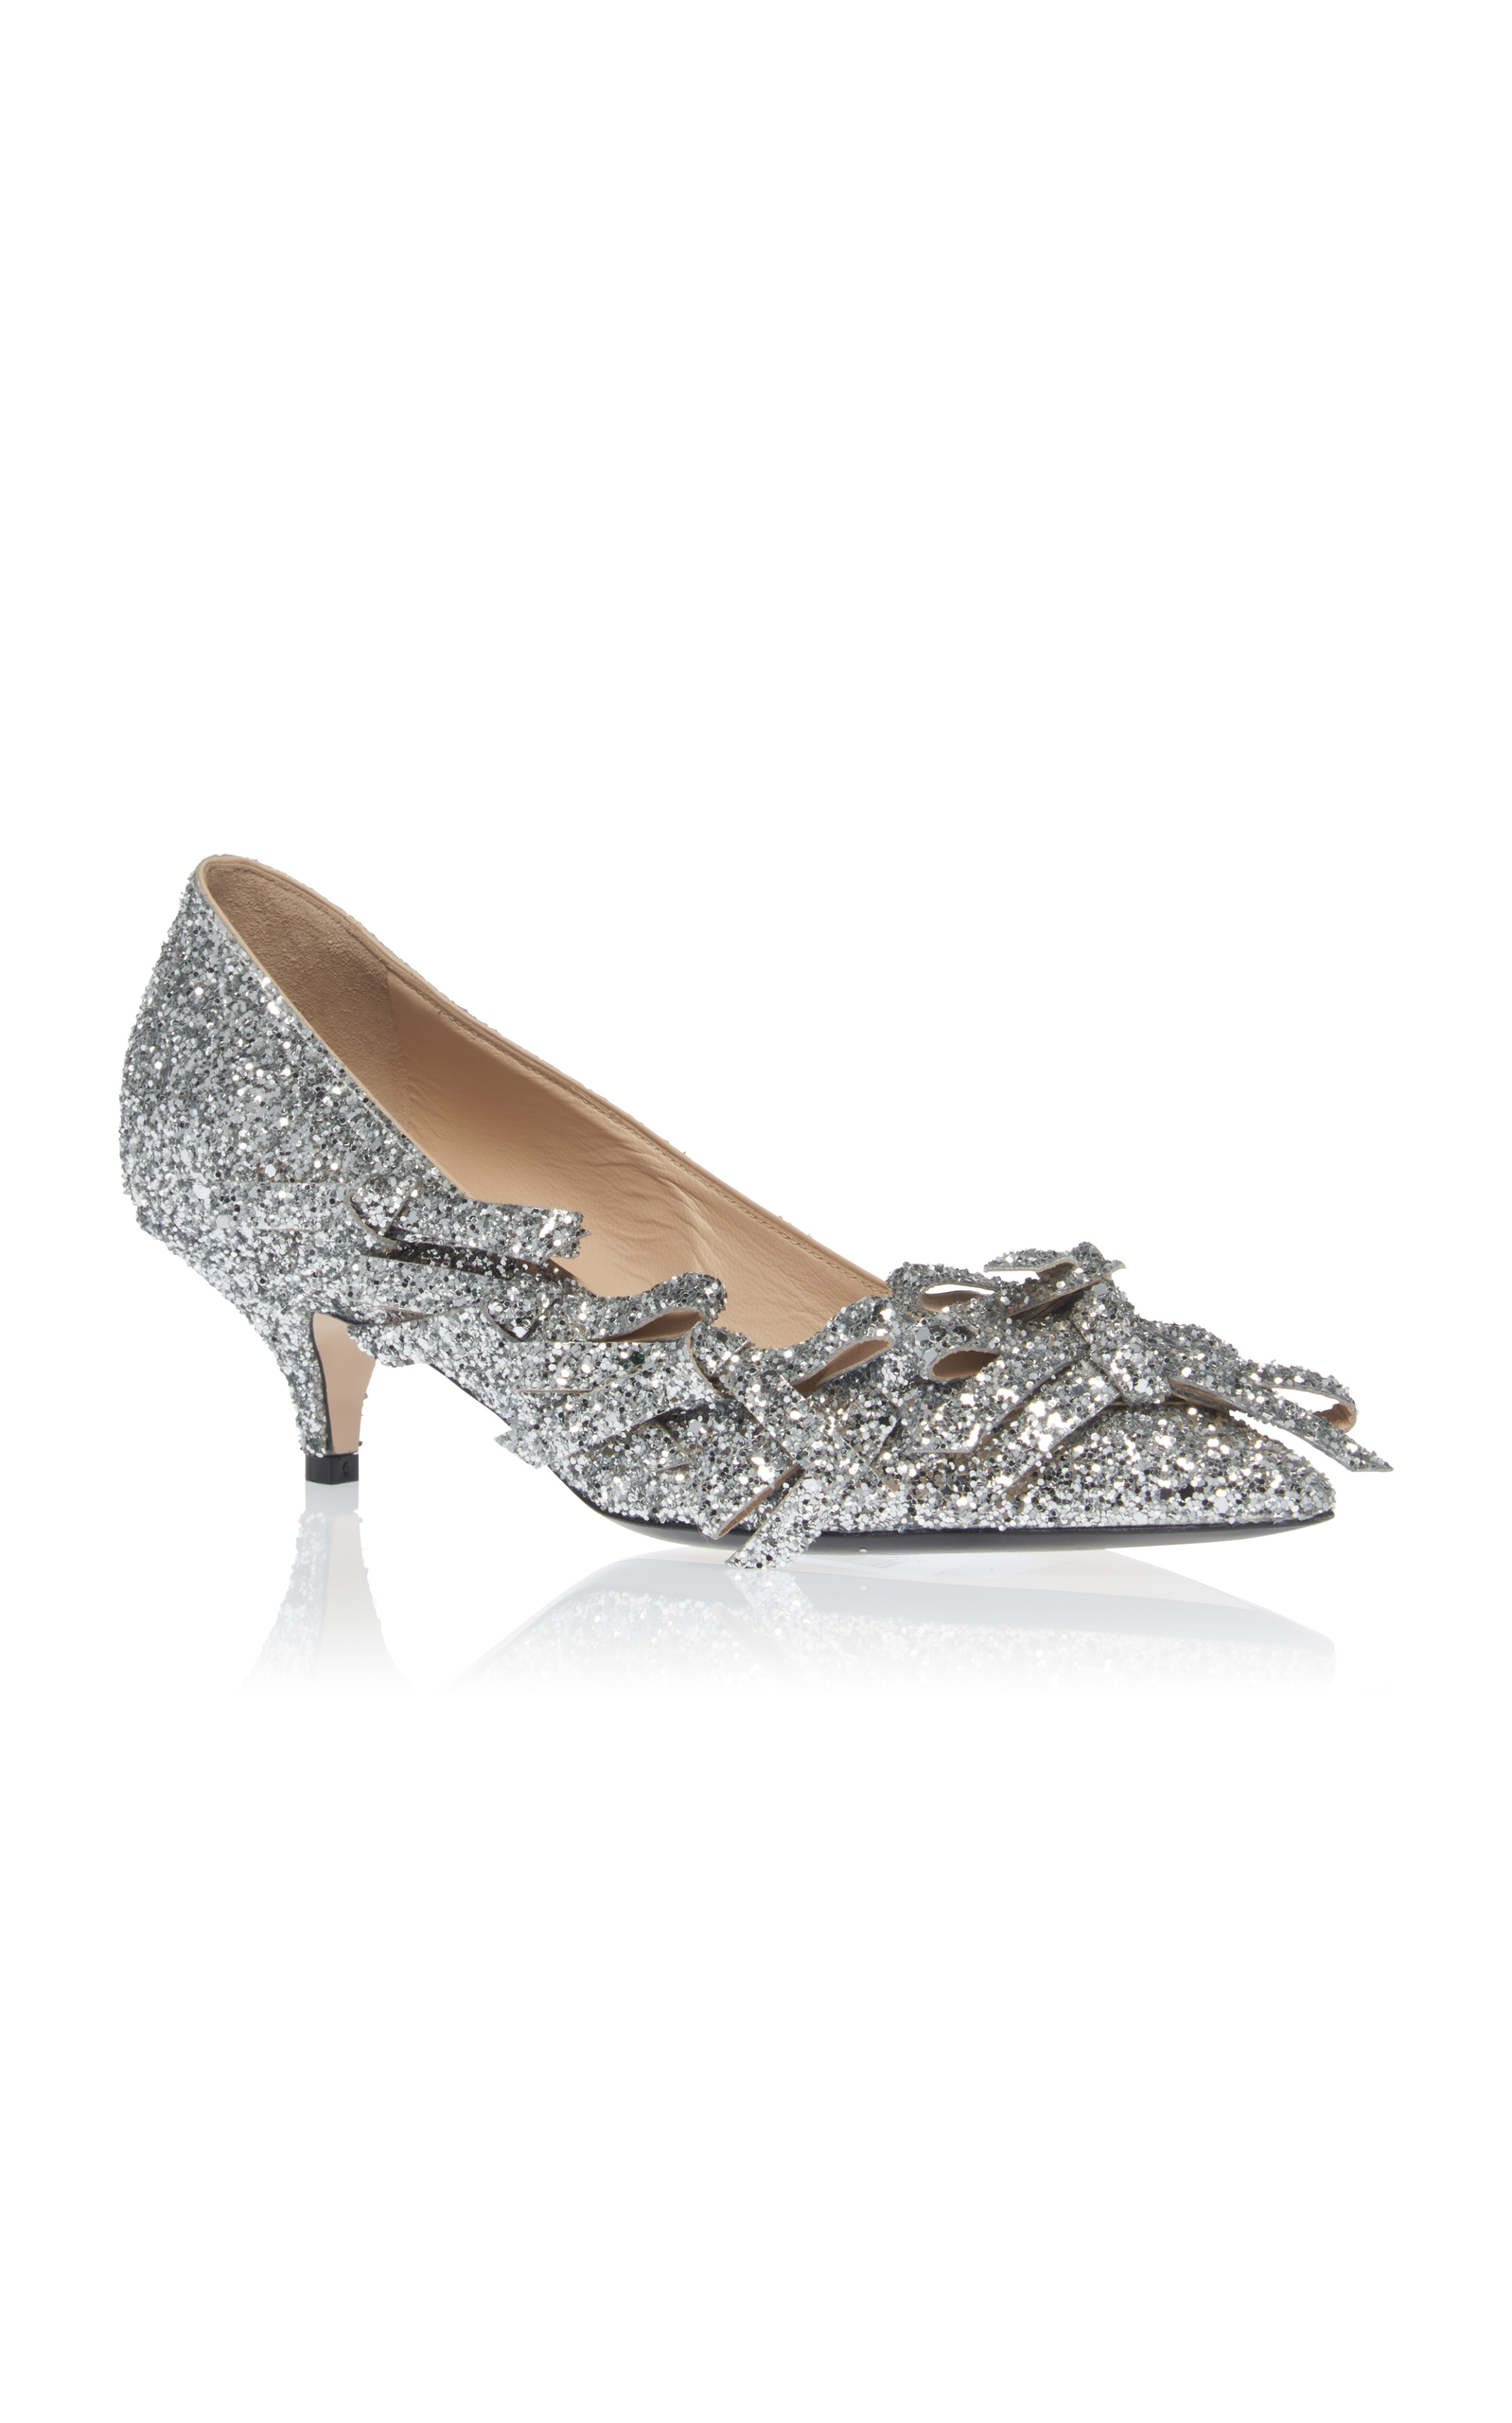 glitter bow detail pumps - Metallic N j9VJUuBMVY